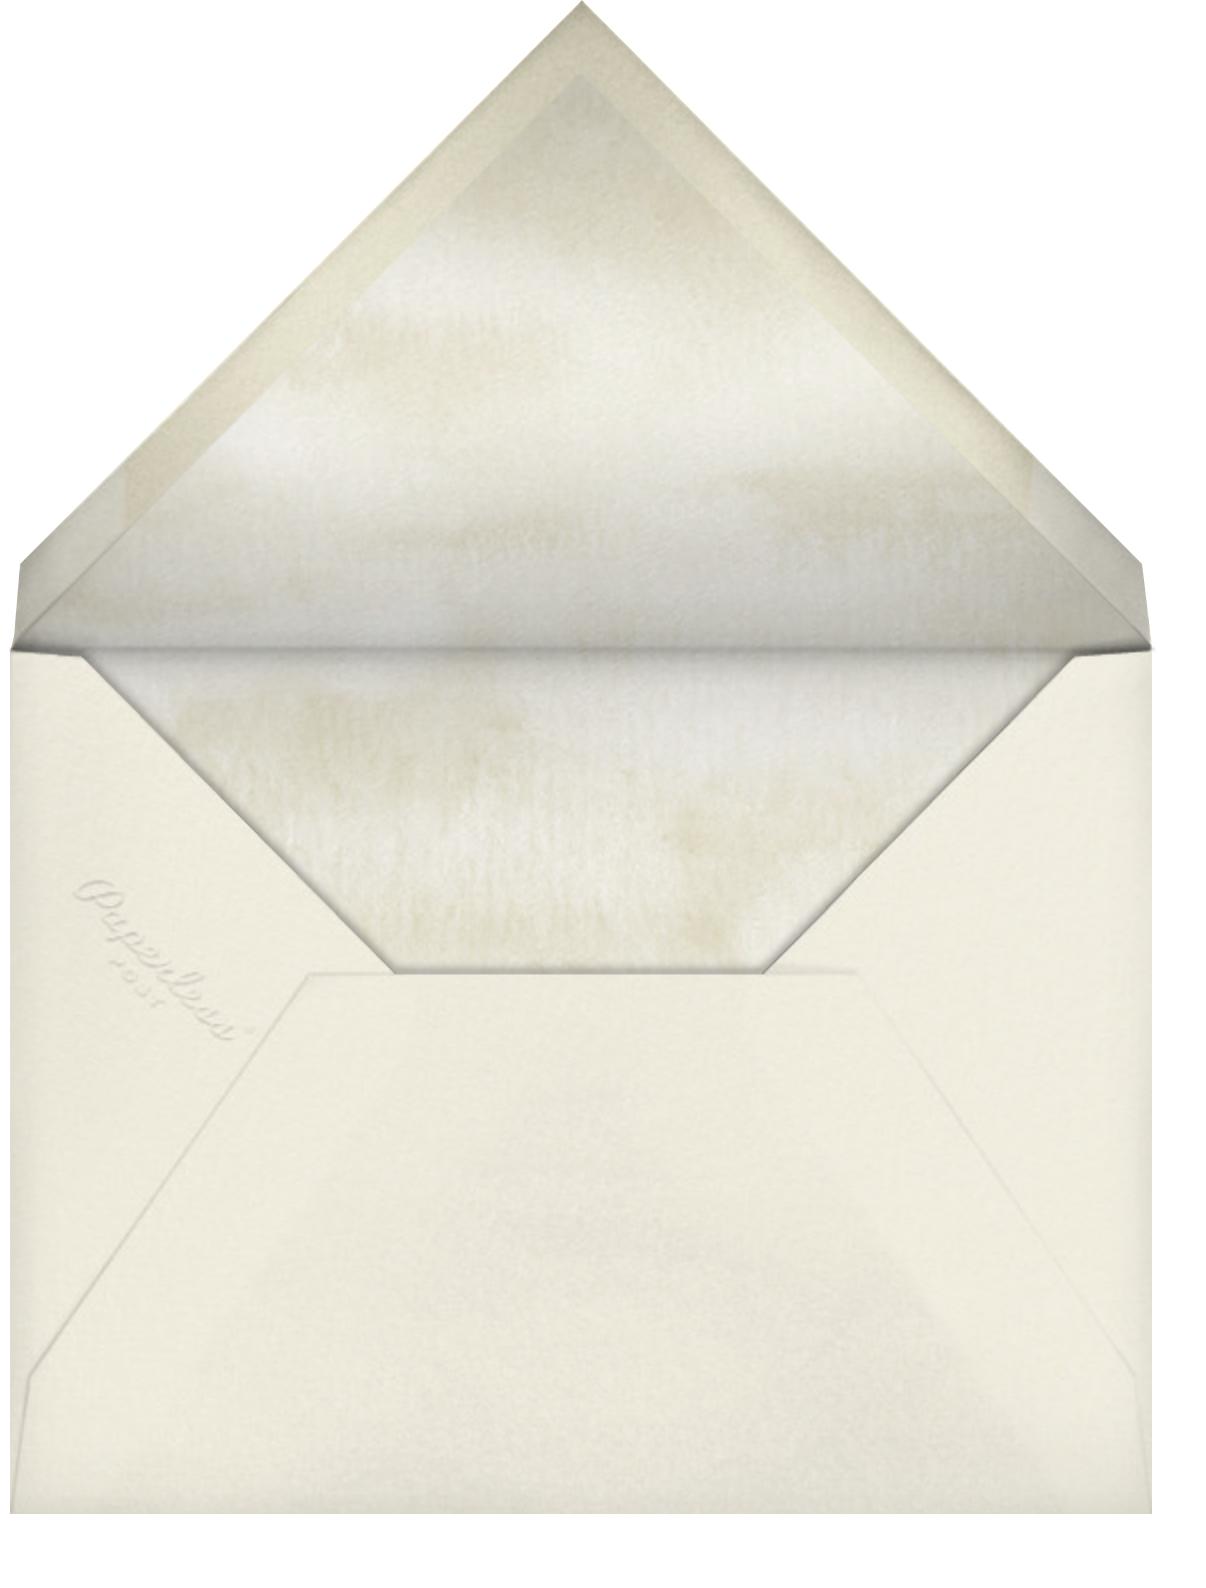 Urim - Felix Doolittle - Hanukkah - envelope back